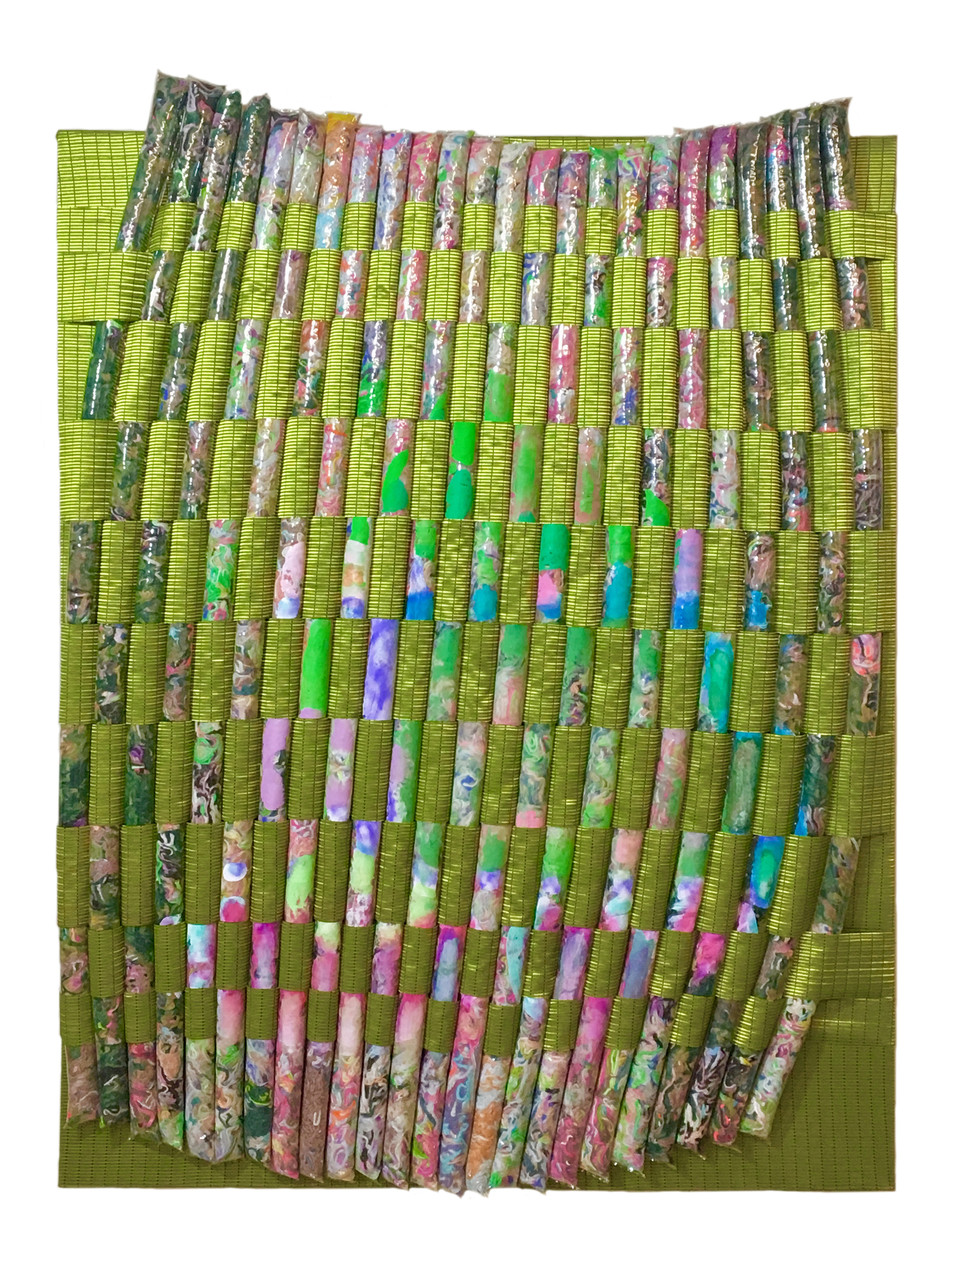 "Pulse Lock / 52"" x 38"" / 2020 / Acrylic, vinyl, yarn, fabric on canvas"